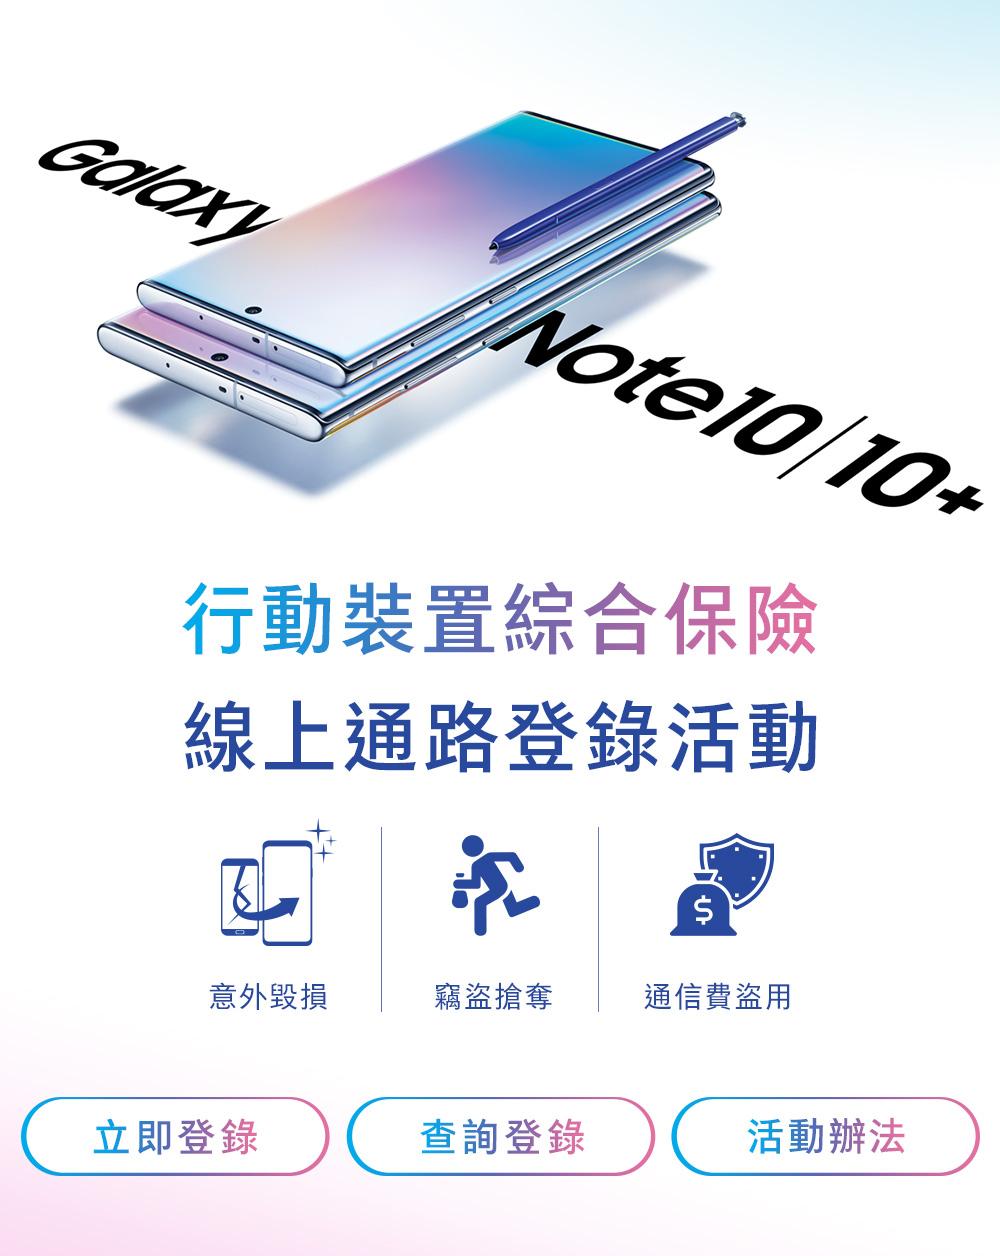 Samsung Galaxy Note10系列 行動裝置綜合保險 線上通路登錄活動 首頁KV